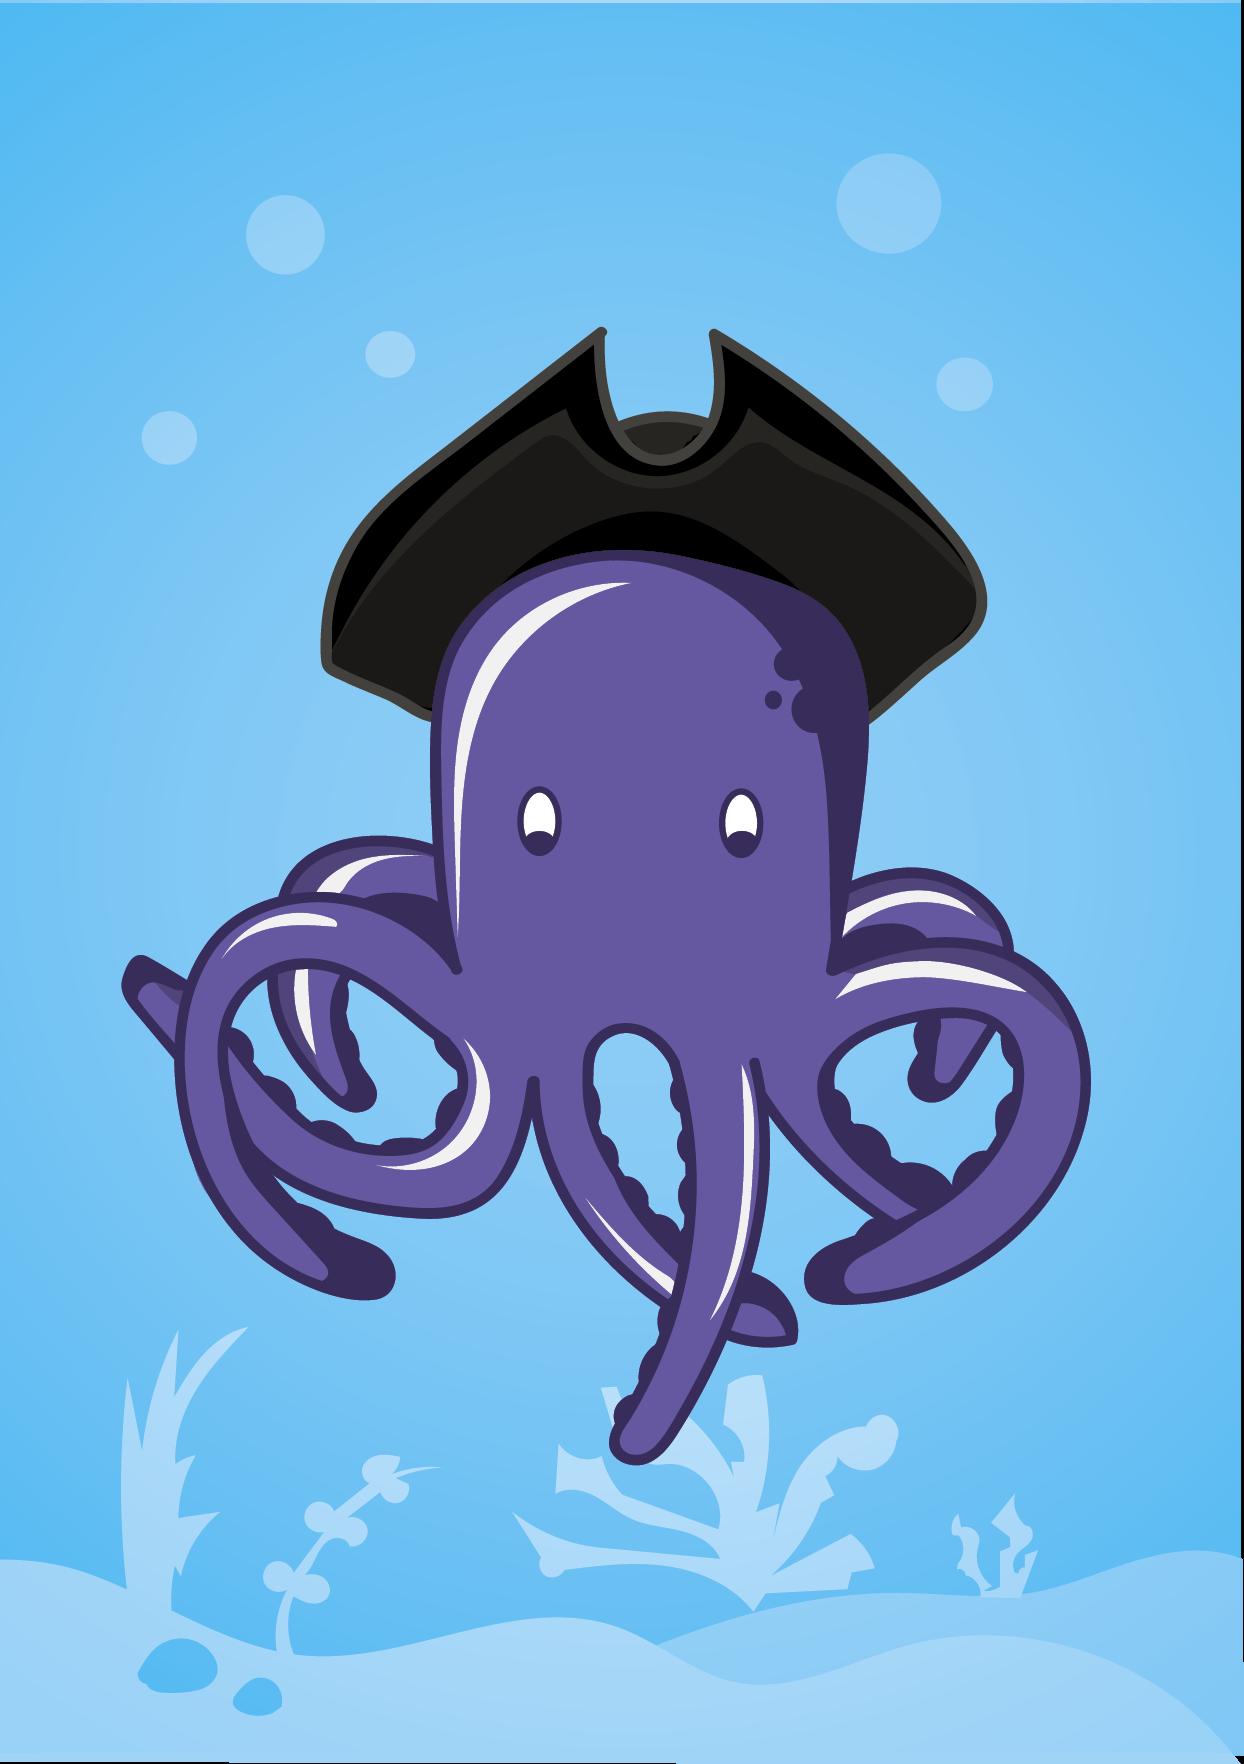 27 oktopus